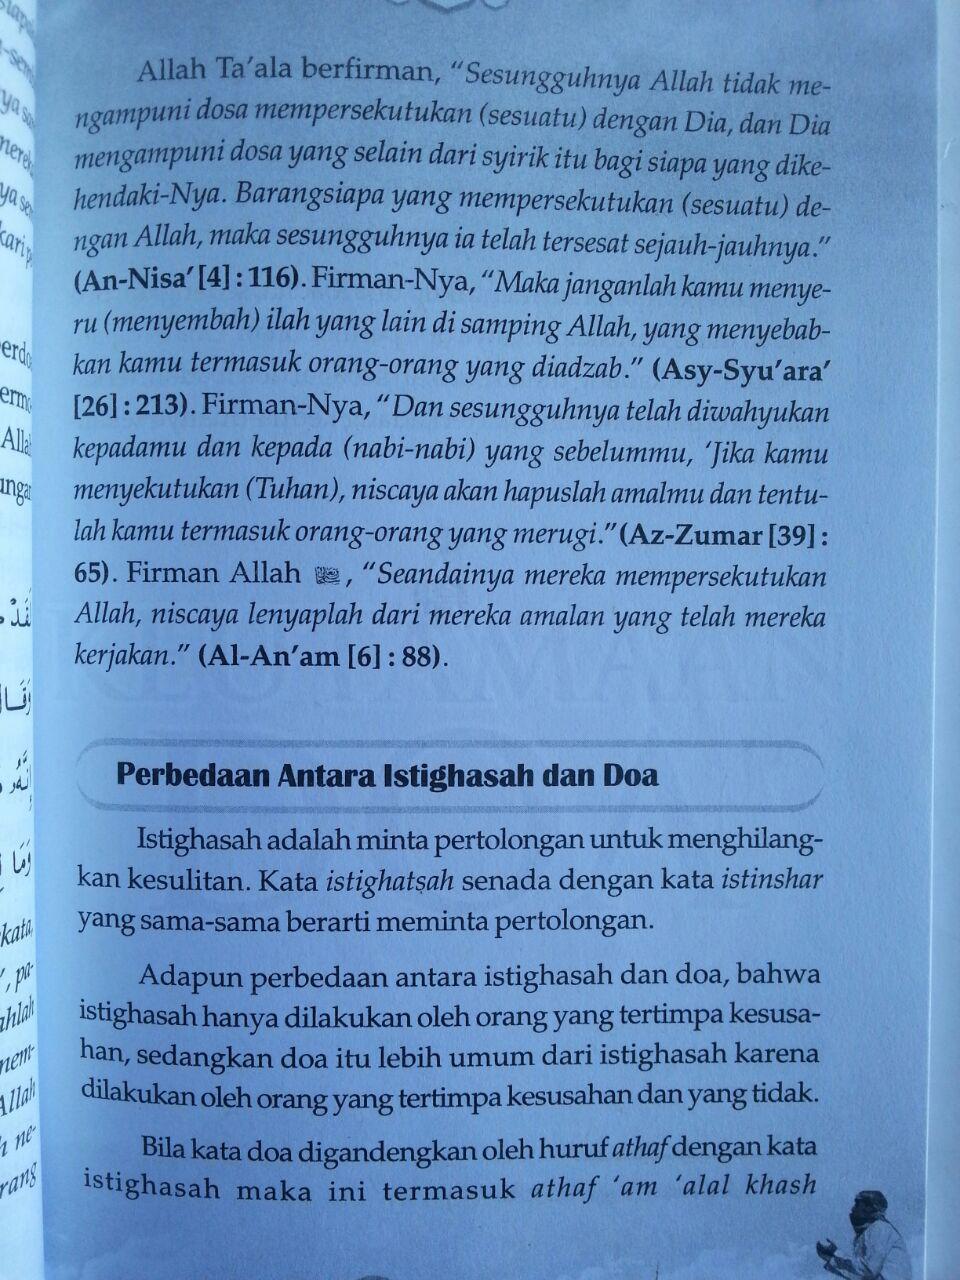 Buku Agar Doamu Terkabul Selalu Panduan Praktis Doa Mustajab isi 3